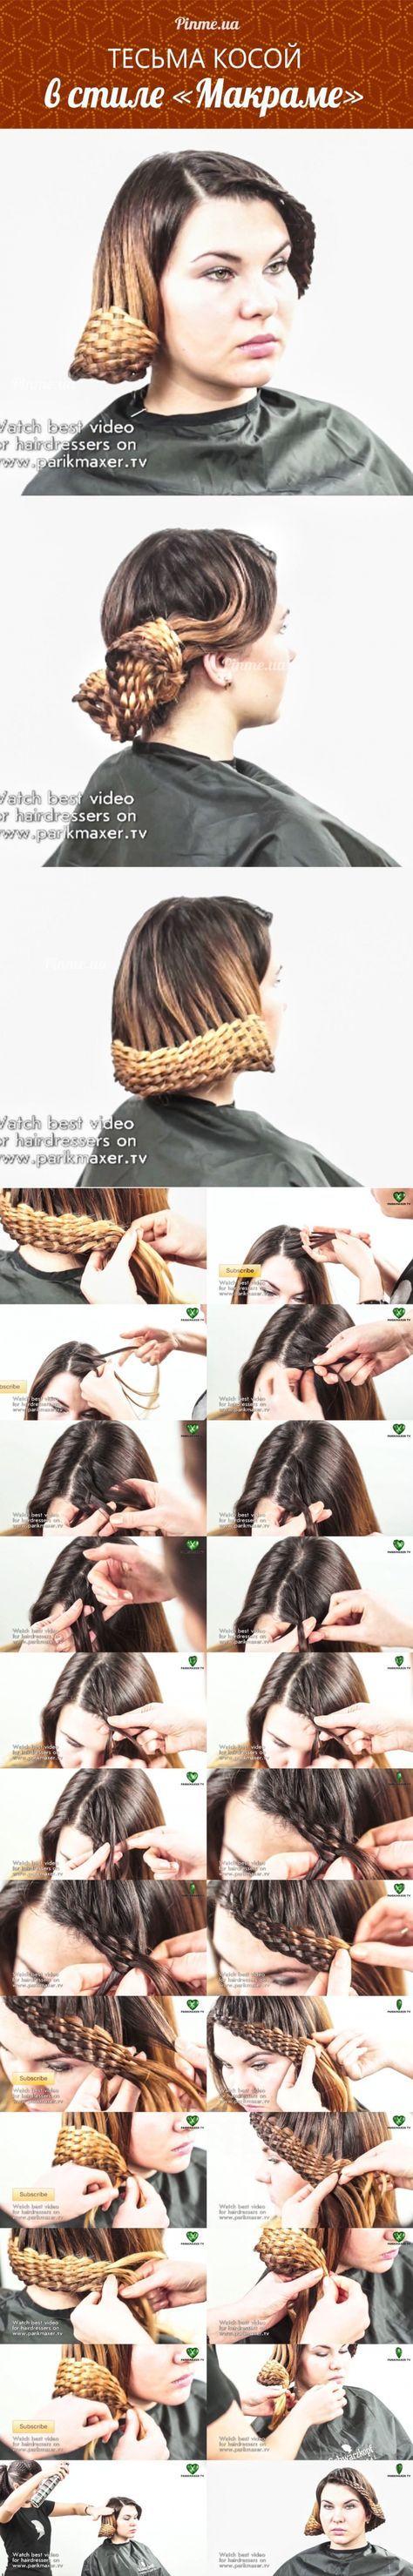 Ажурное плетение волос в стиле «Макраме» → Виде-урок Amazing woven hair braid